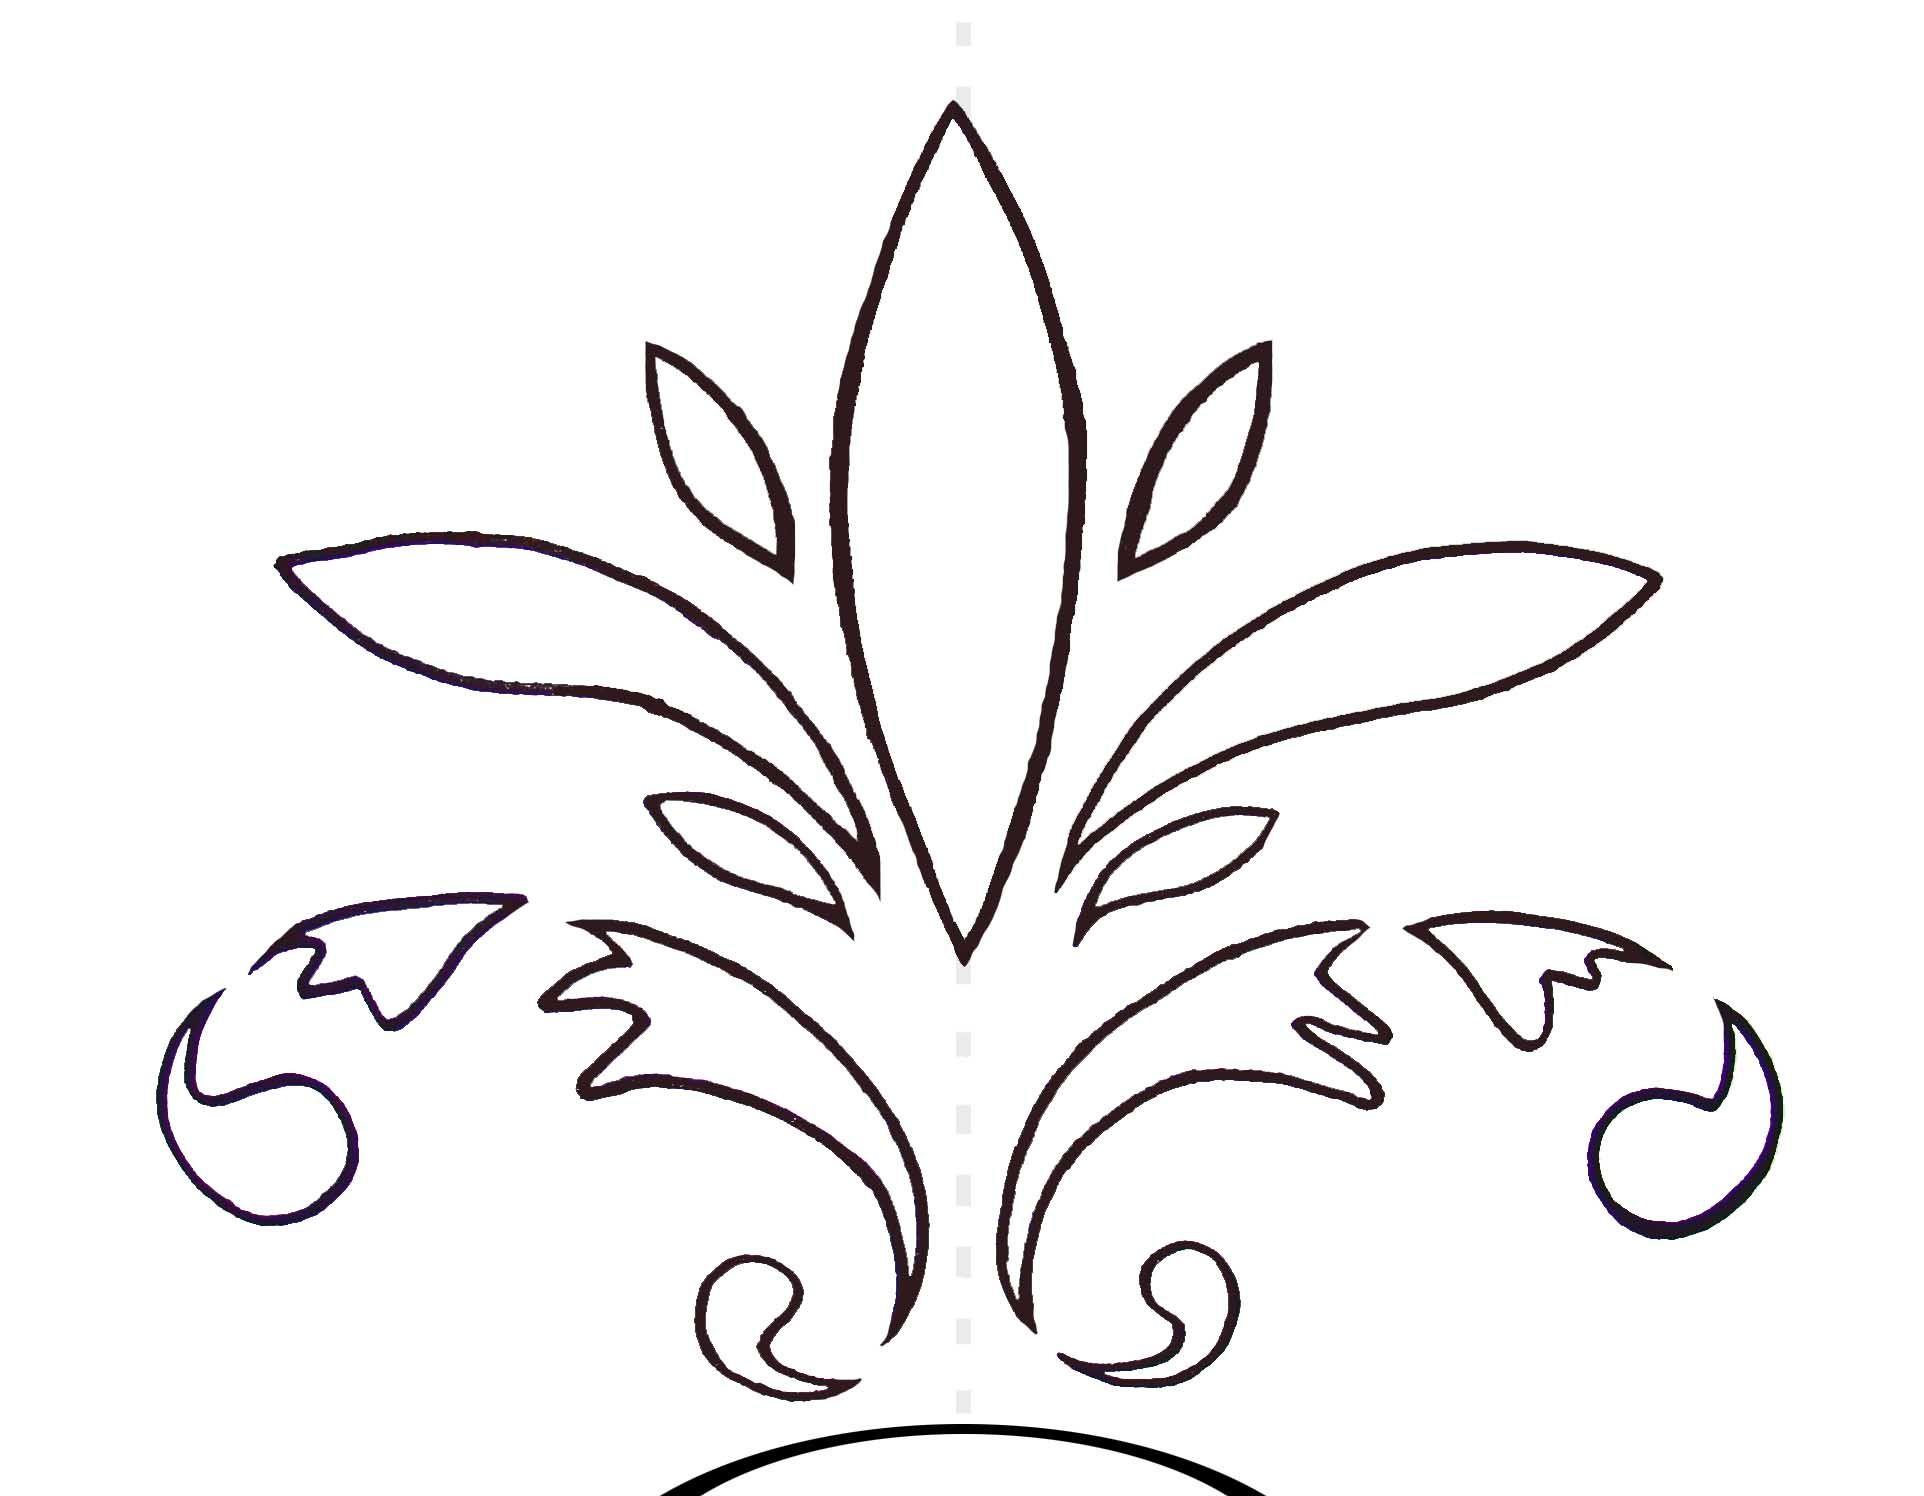 image relating to Fleur De Lis Stencil Printable referred to as Printable Fleur De Lis Stencil Clipart No cost obtain ideal